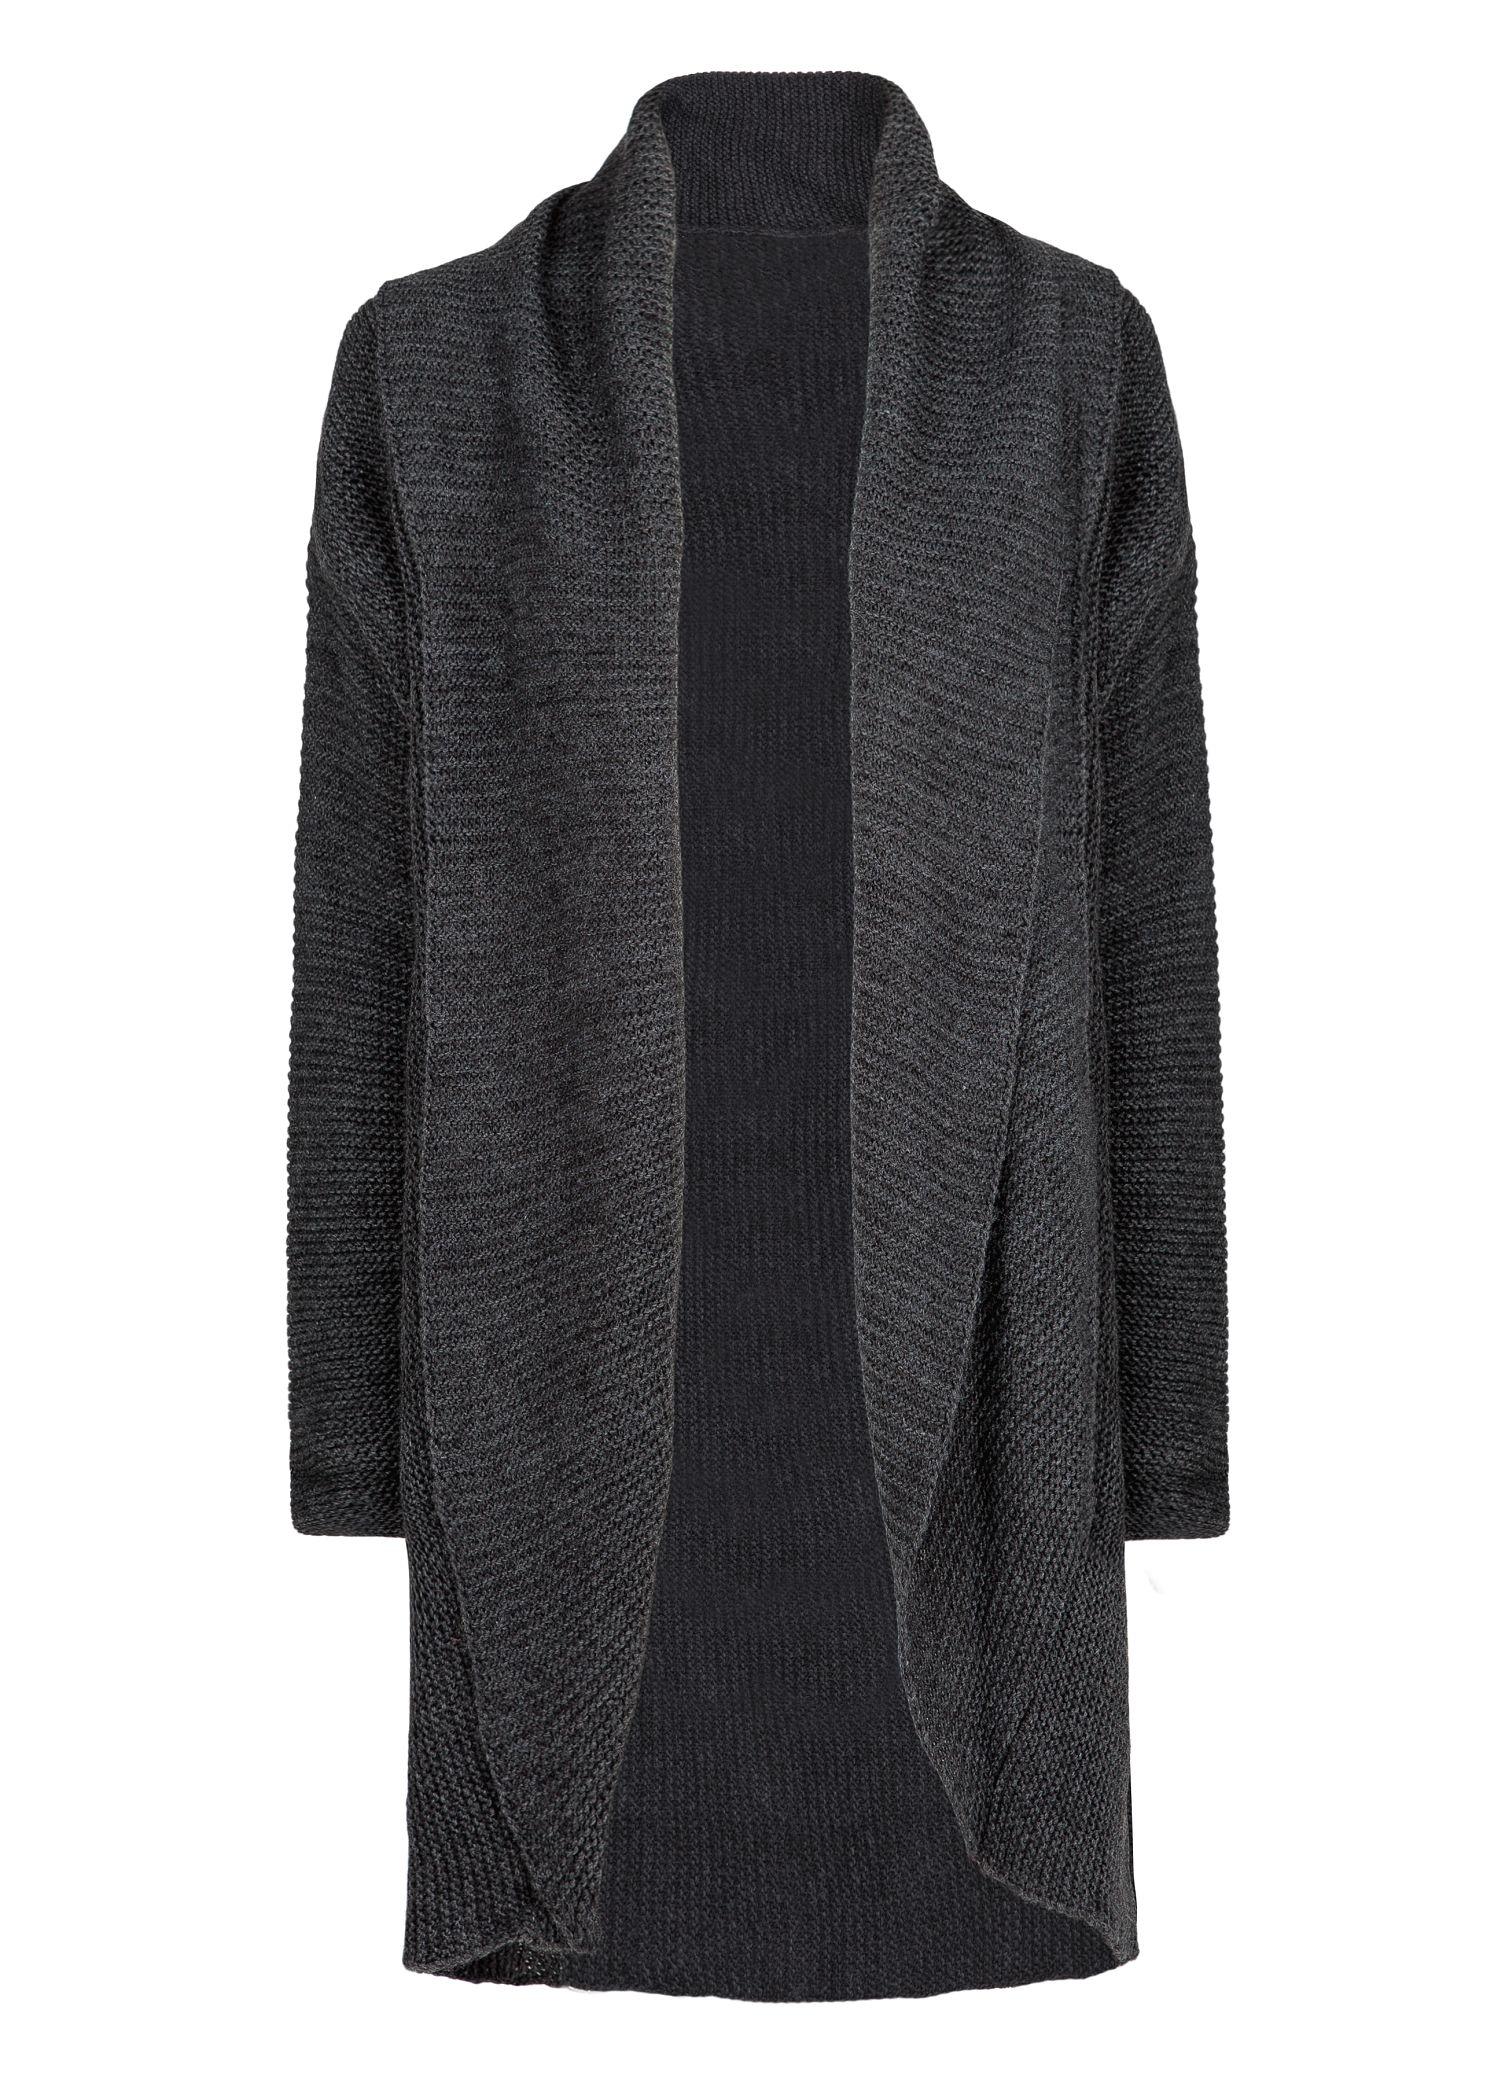 Mango Alpaca Woolblend Chunky Knit Cardigan in Gray | Lyst